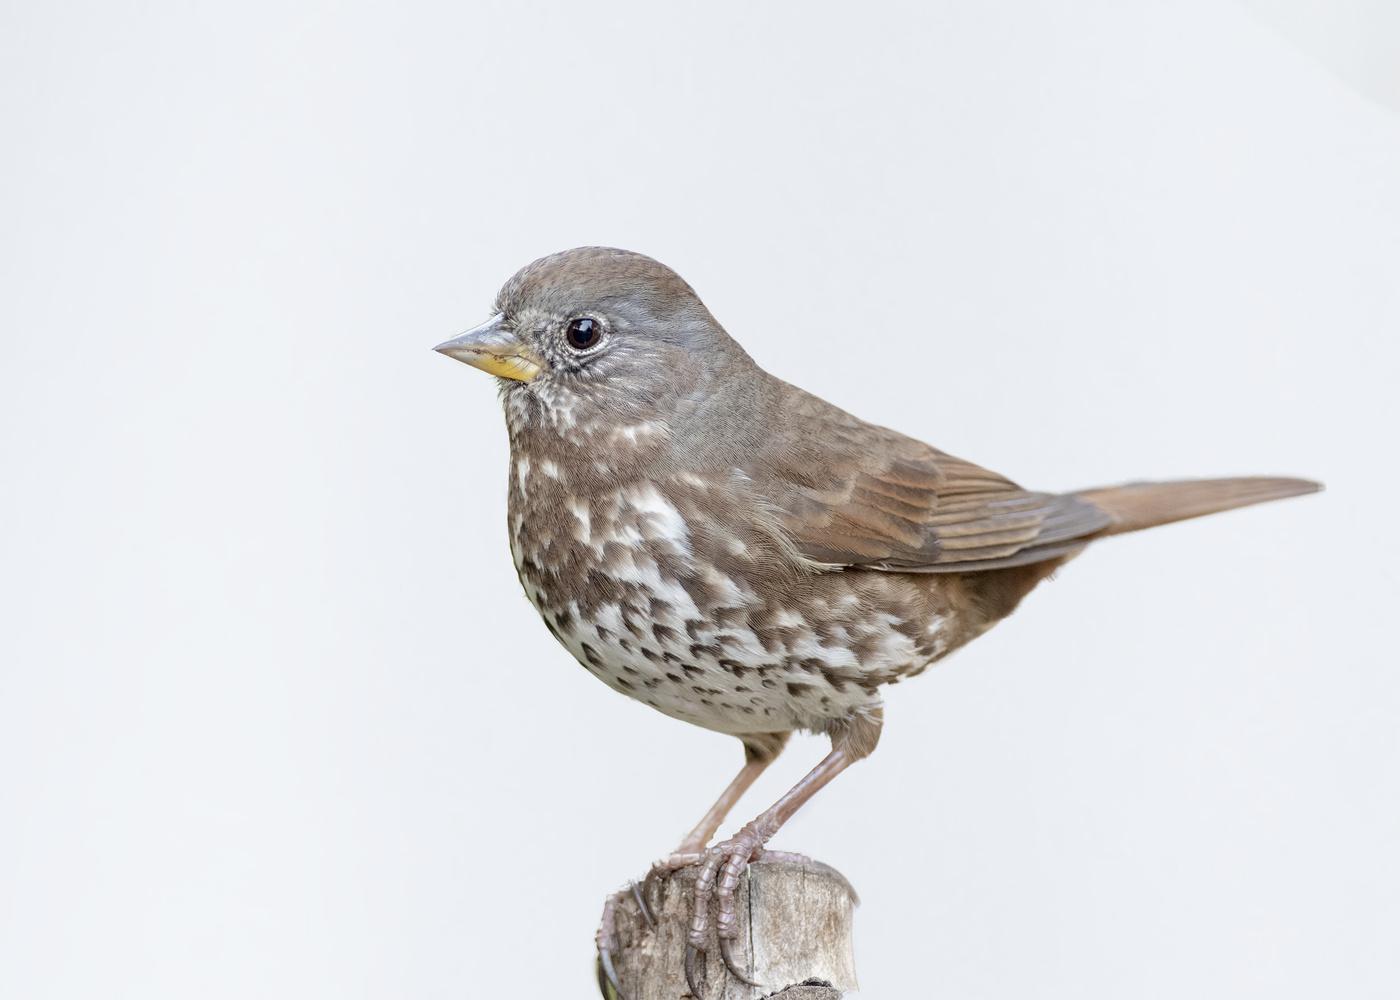 Fox Sparrow by Nickolas Thurston